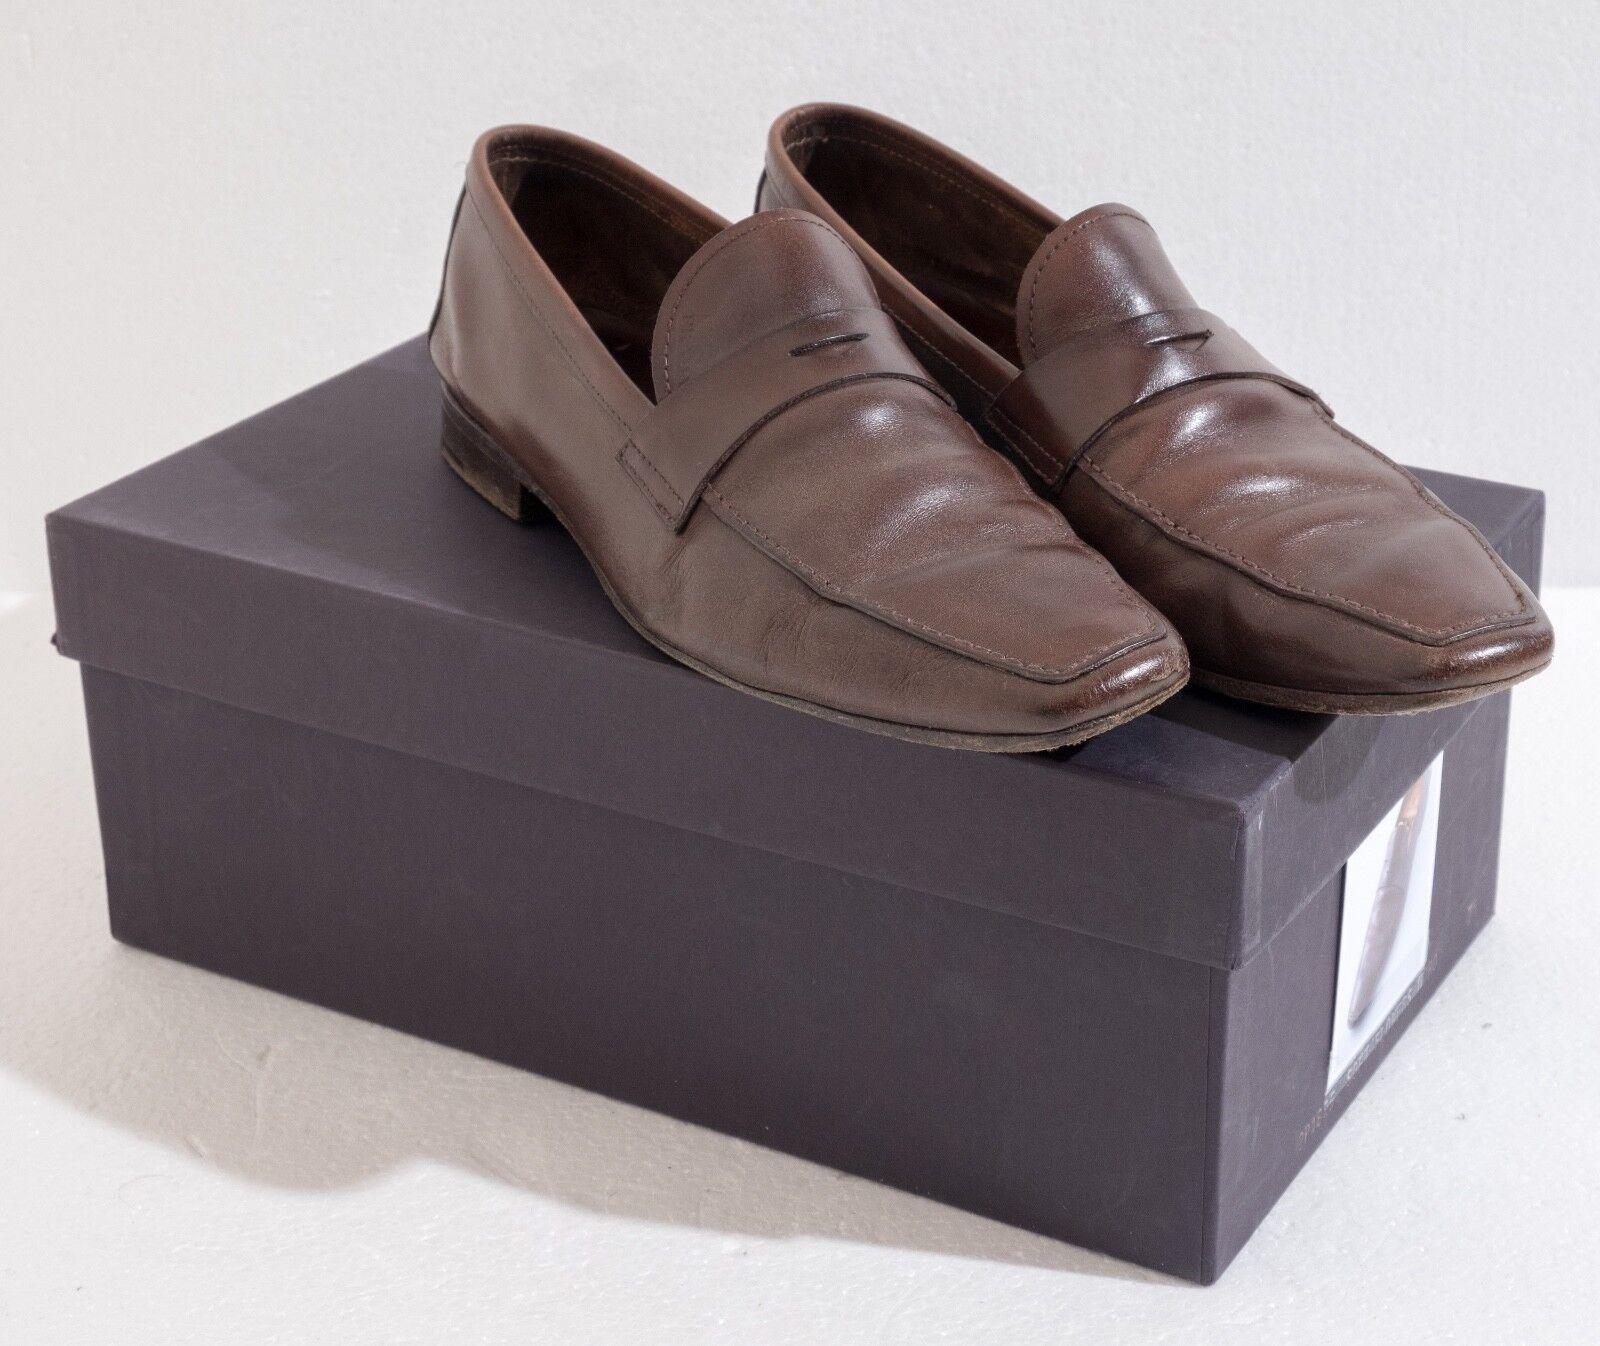 Genuine Genuine Genuine Prada Mens Brown Leather Loafers Size 8 (Style 1727) 2ec15b